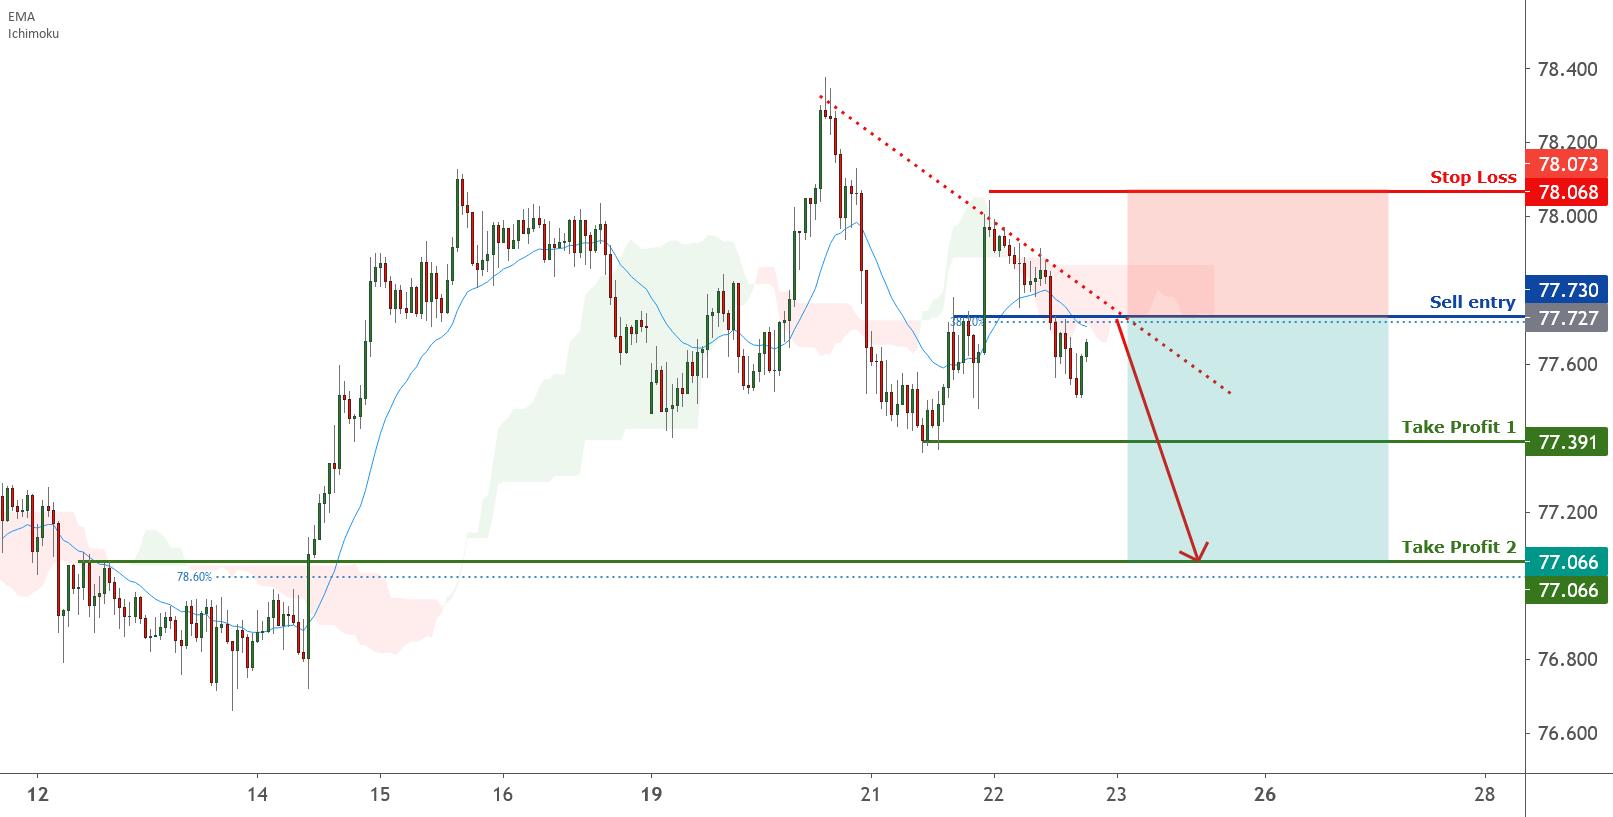 NZDJPY is facing bearish pressure | 22 Apr 2021 for FX:NZDJPY by FXCM